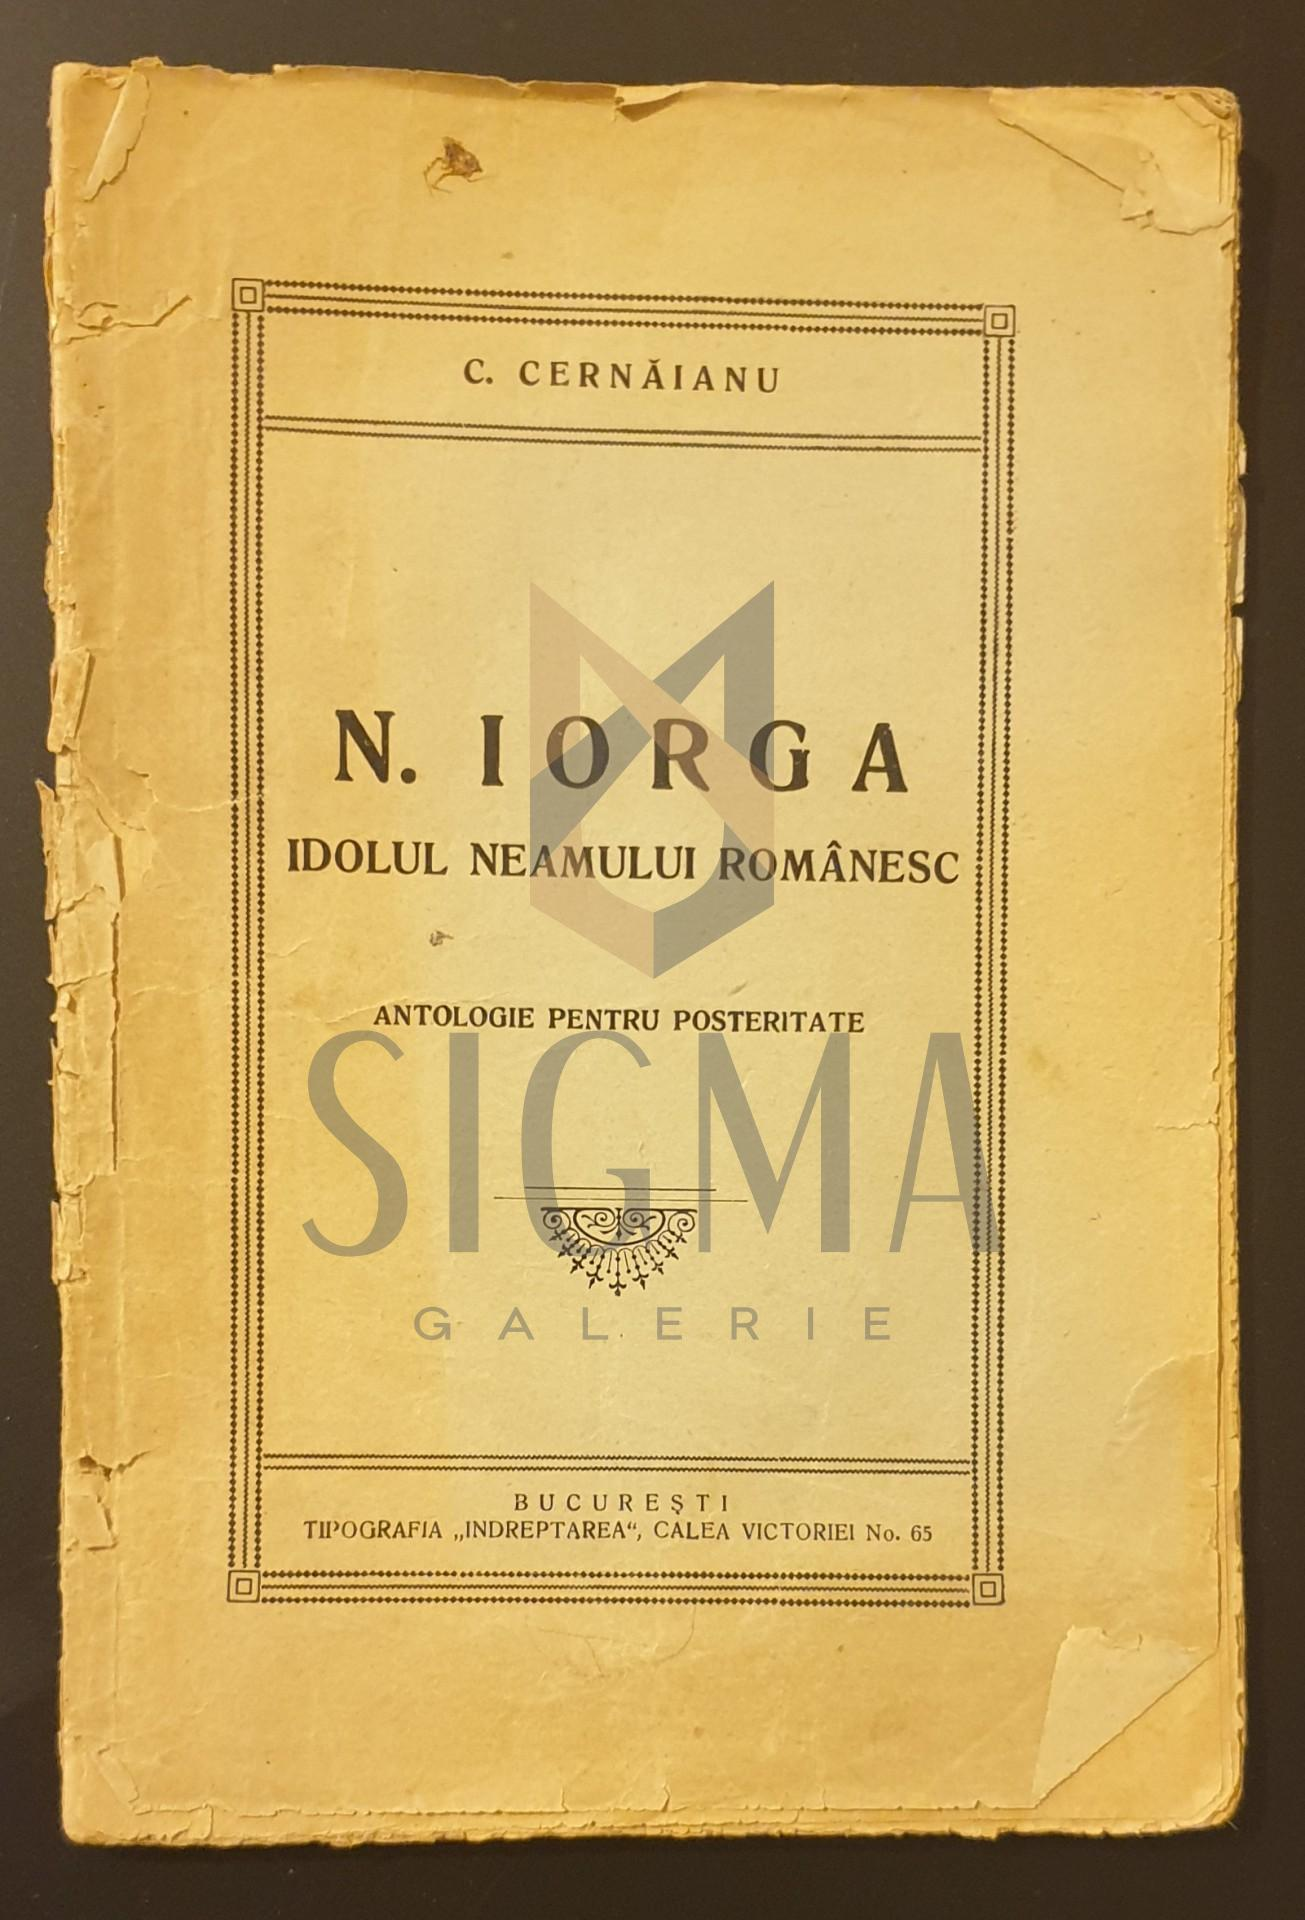 N. Iorga idolul neamului romanesc